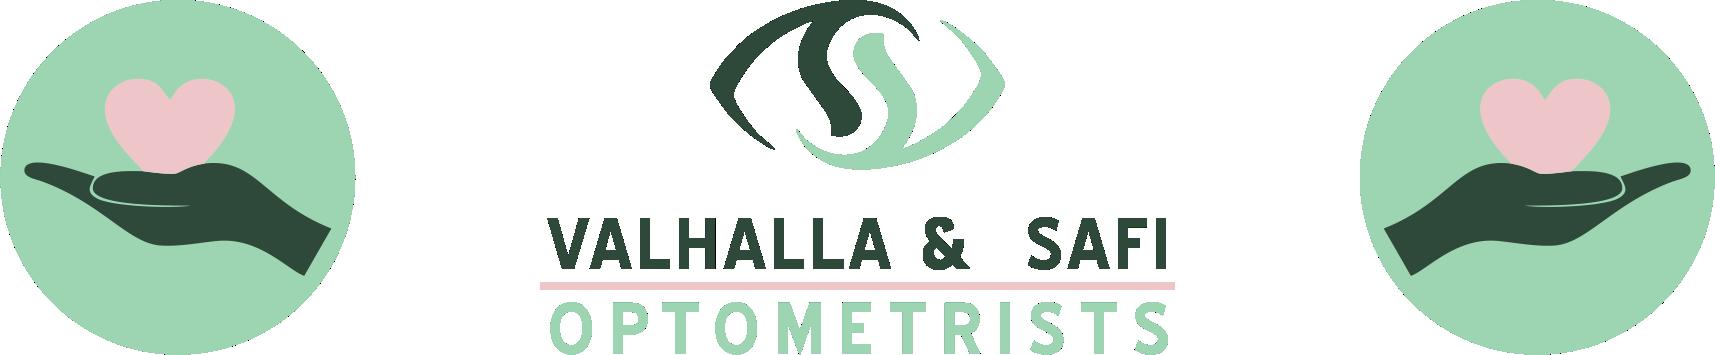 Valhalla & SAFI Optometrists Logo Community